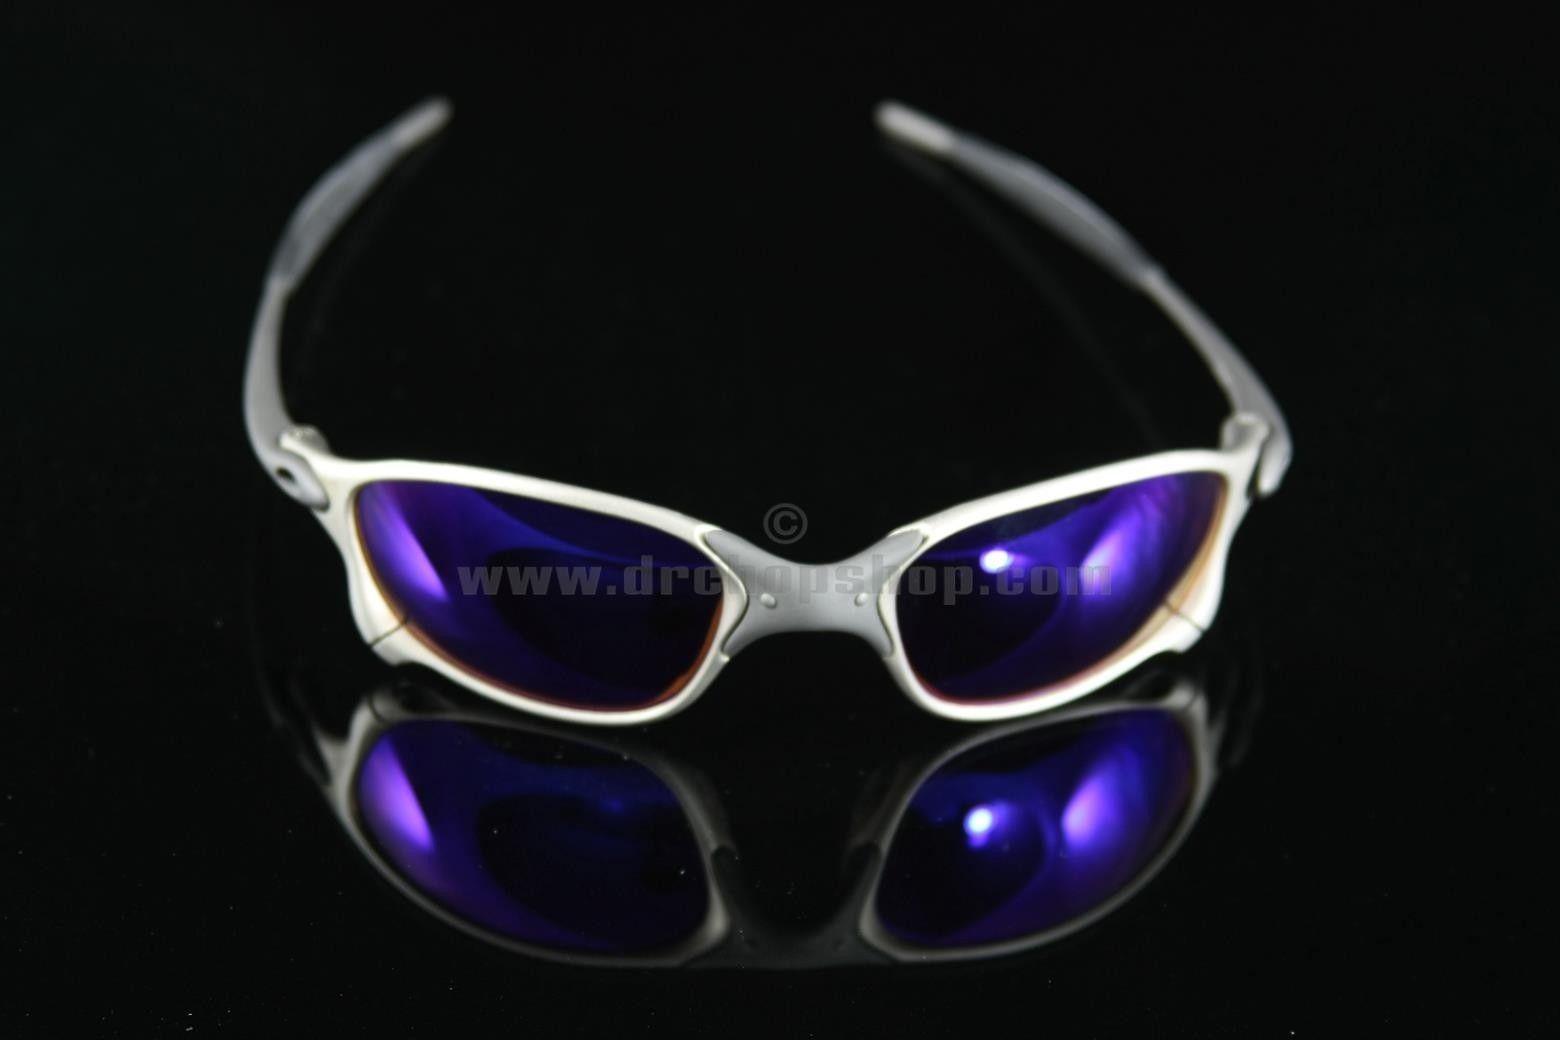 Custom X Metal Lenses Penny, XX, And Juliet - 134288_551089701569387_229819706_o.jpg